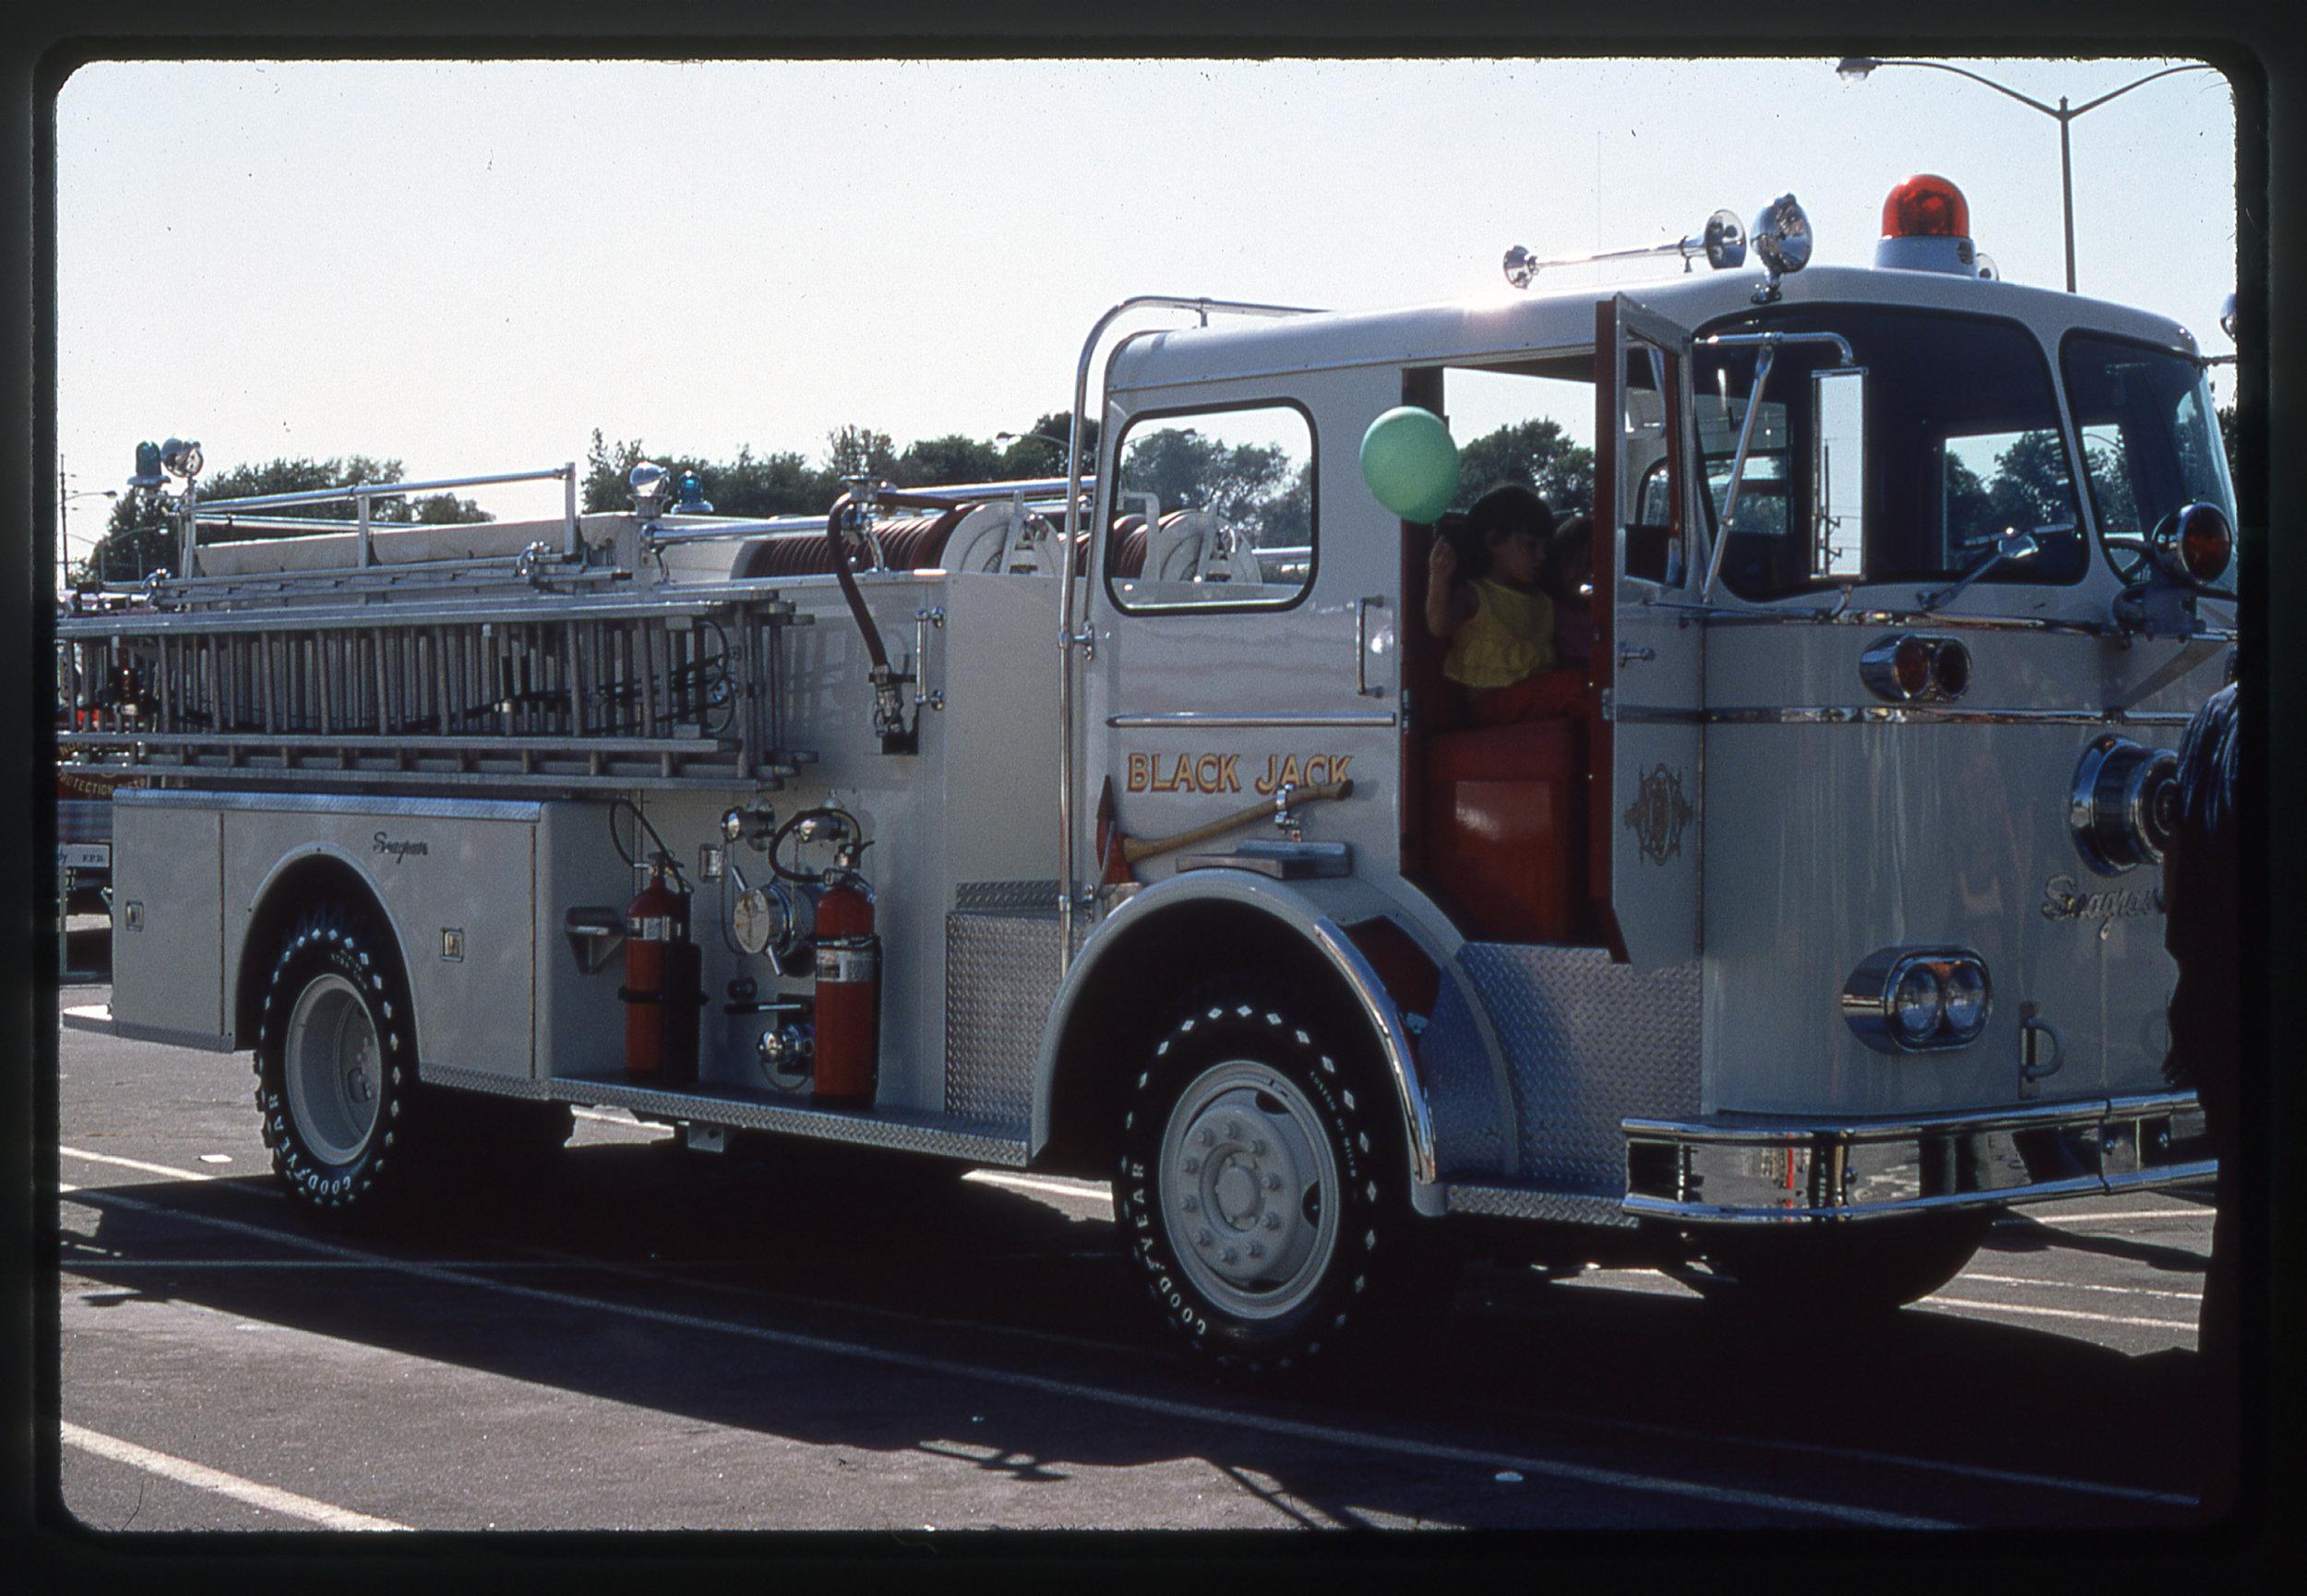 MO Black Jack 1967 Seagrave 800-KB-1250 #Q-4283 1250_500 #4225.jpg